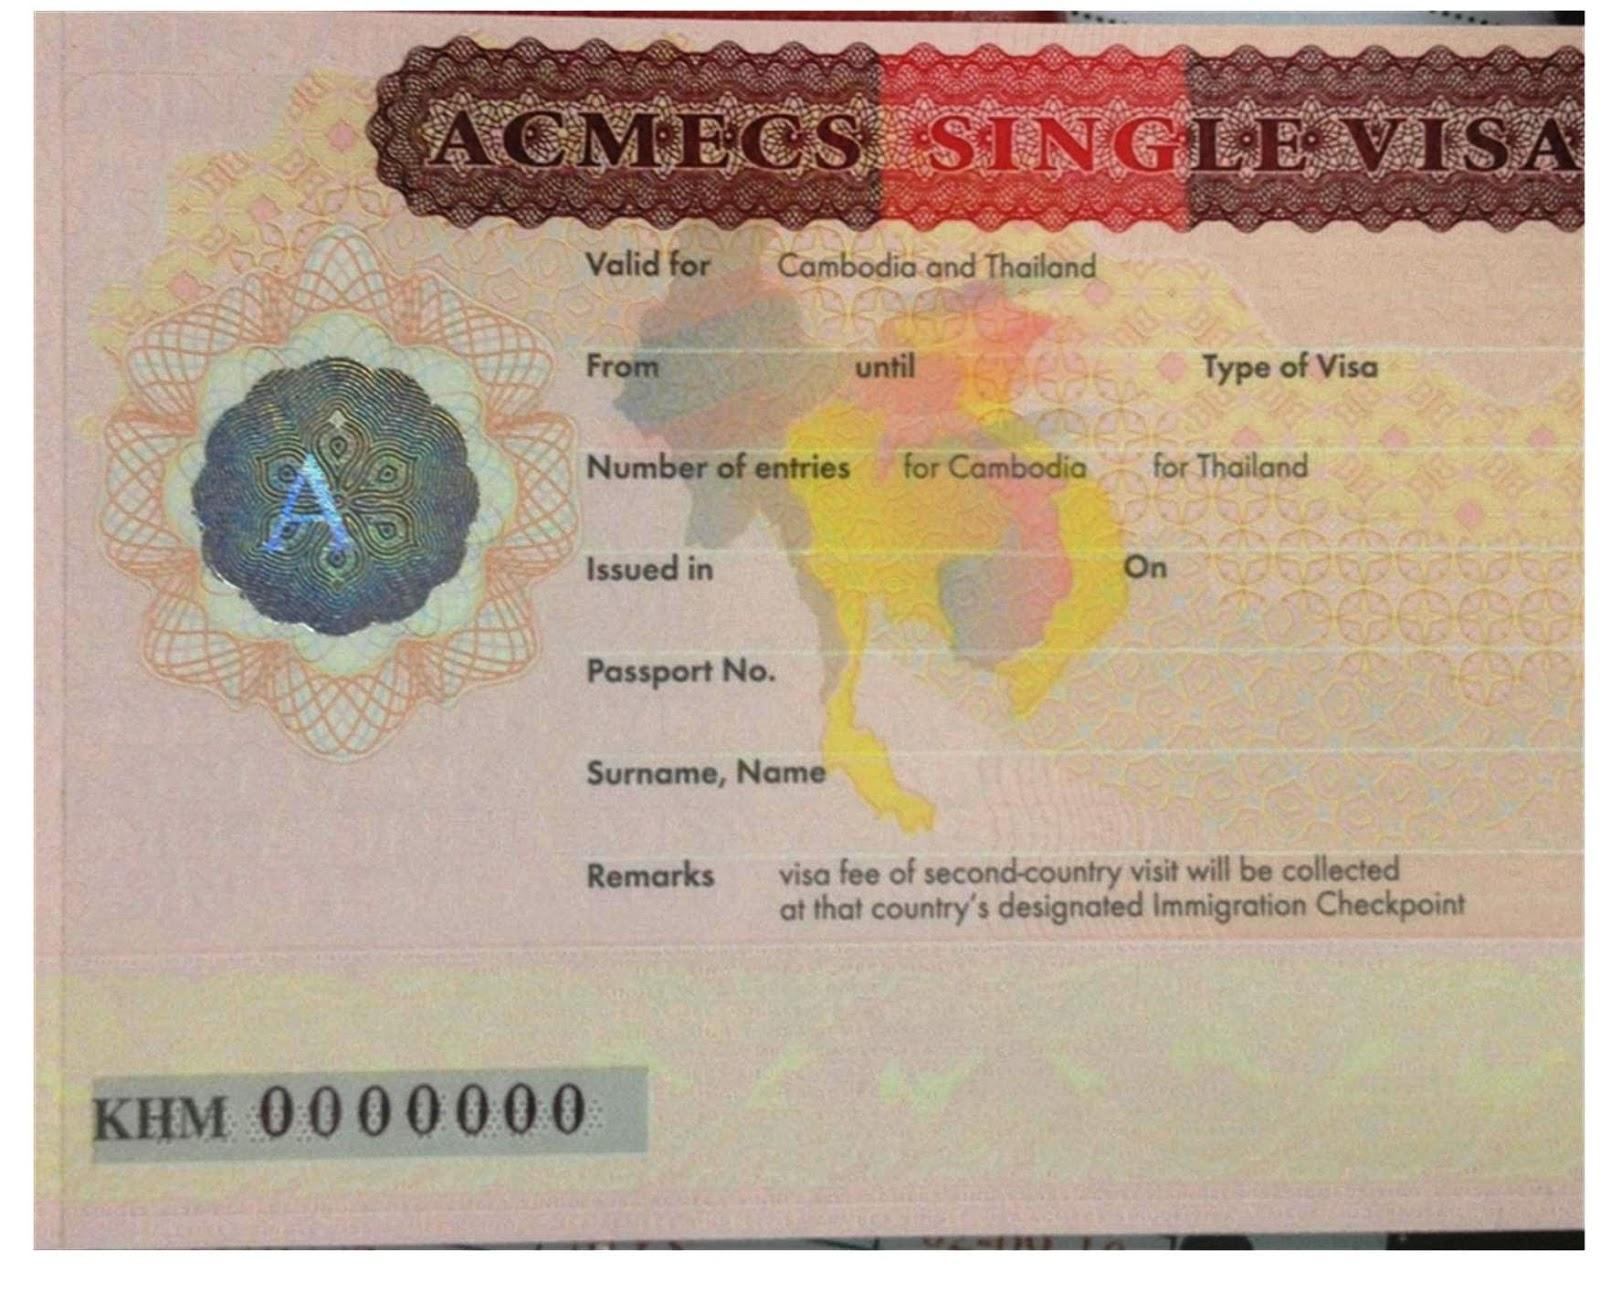 ACMECS SINGLE VISA PDF